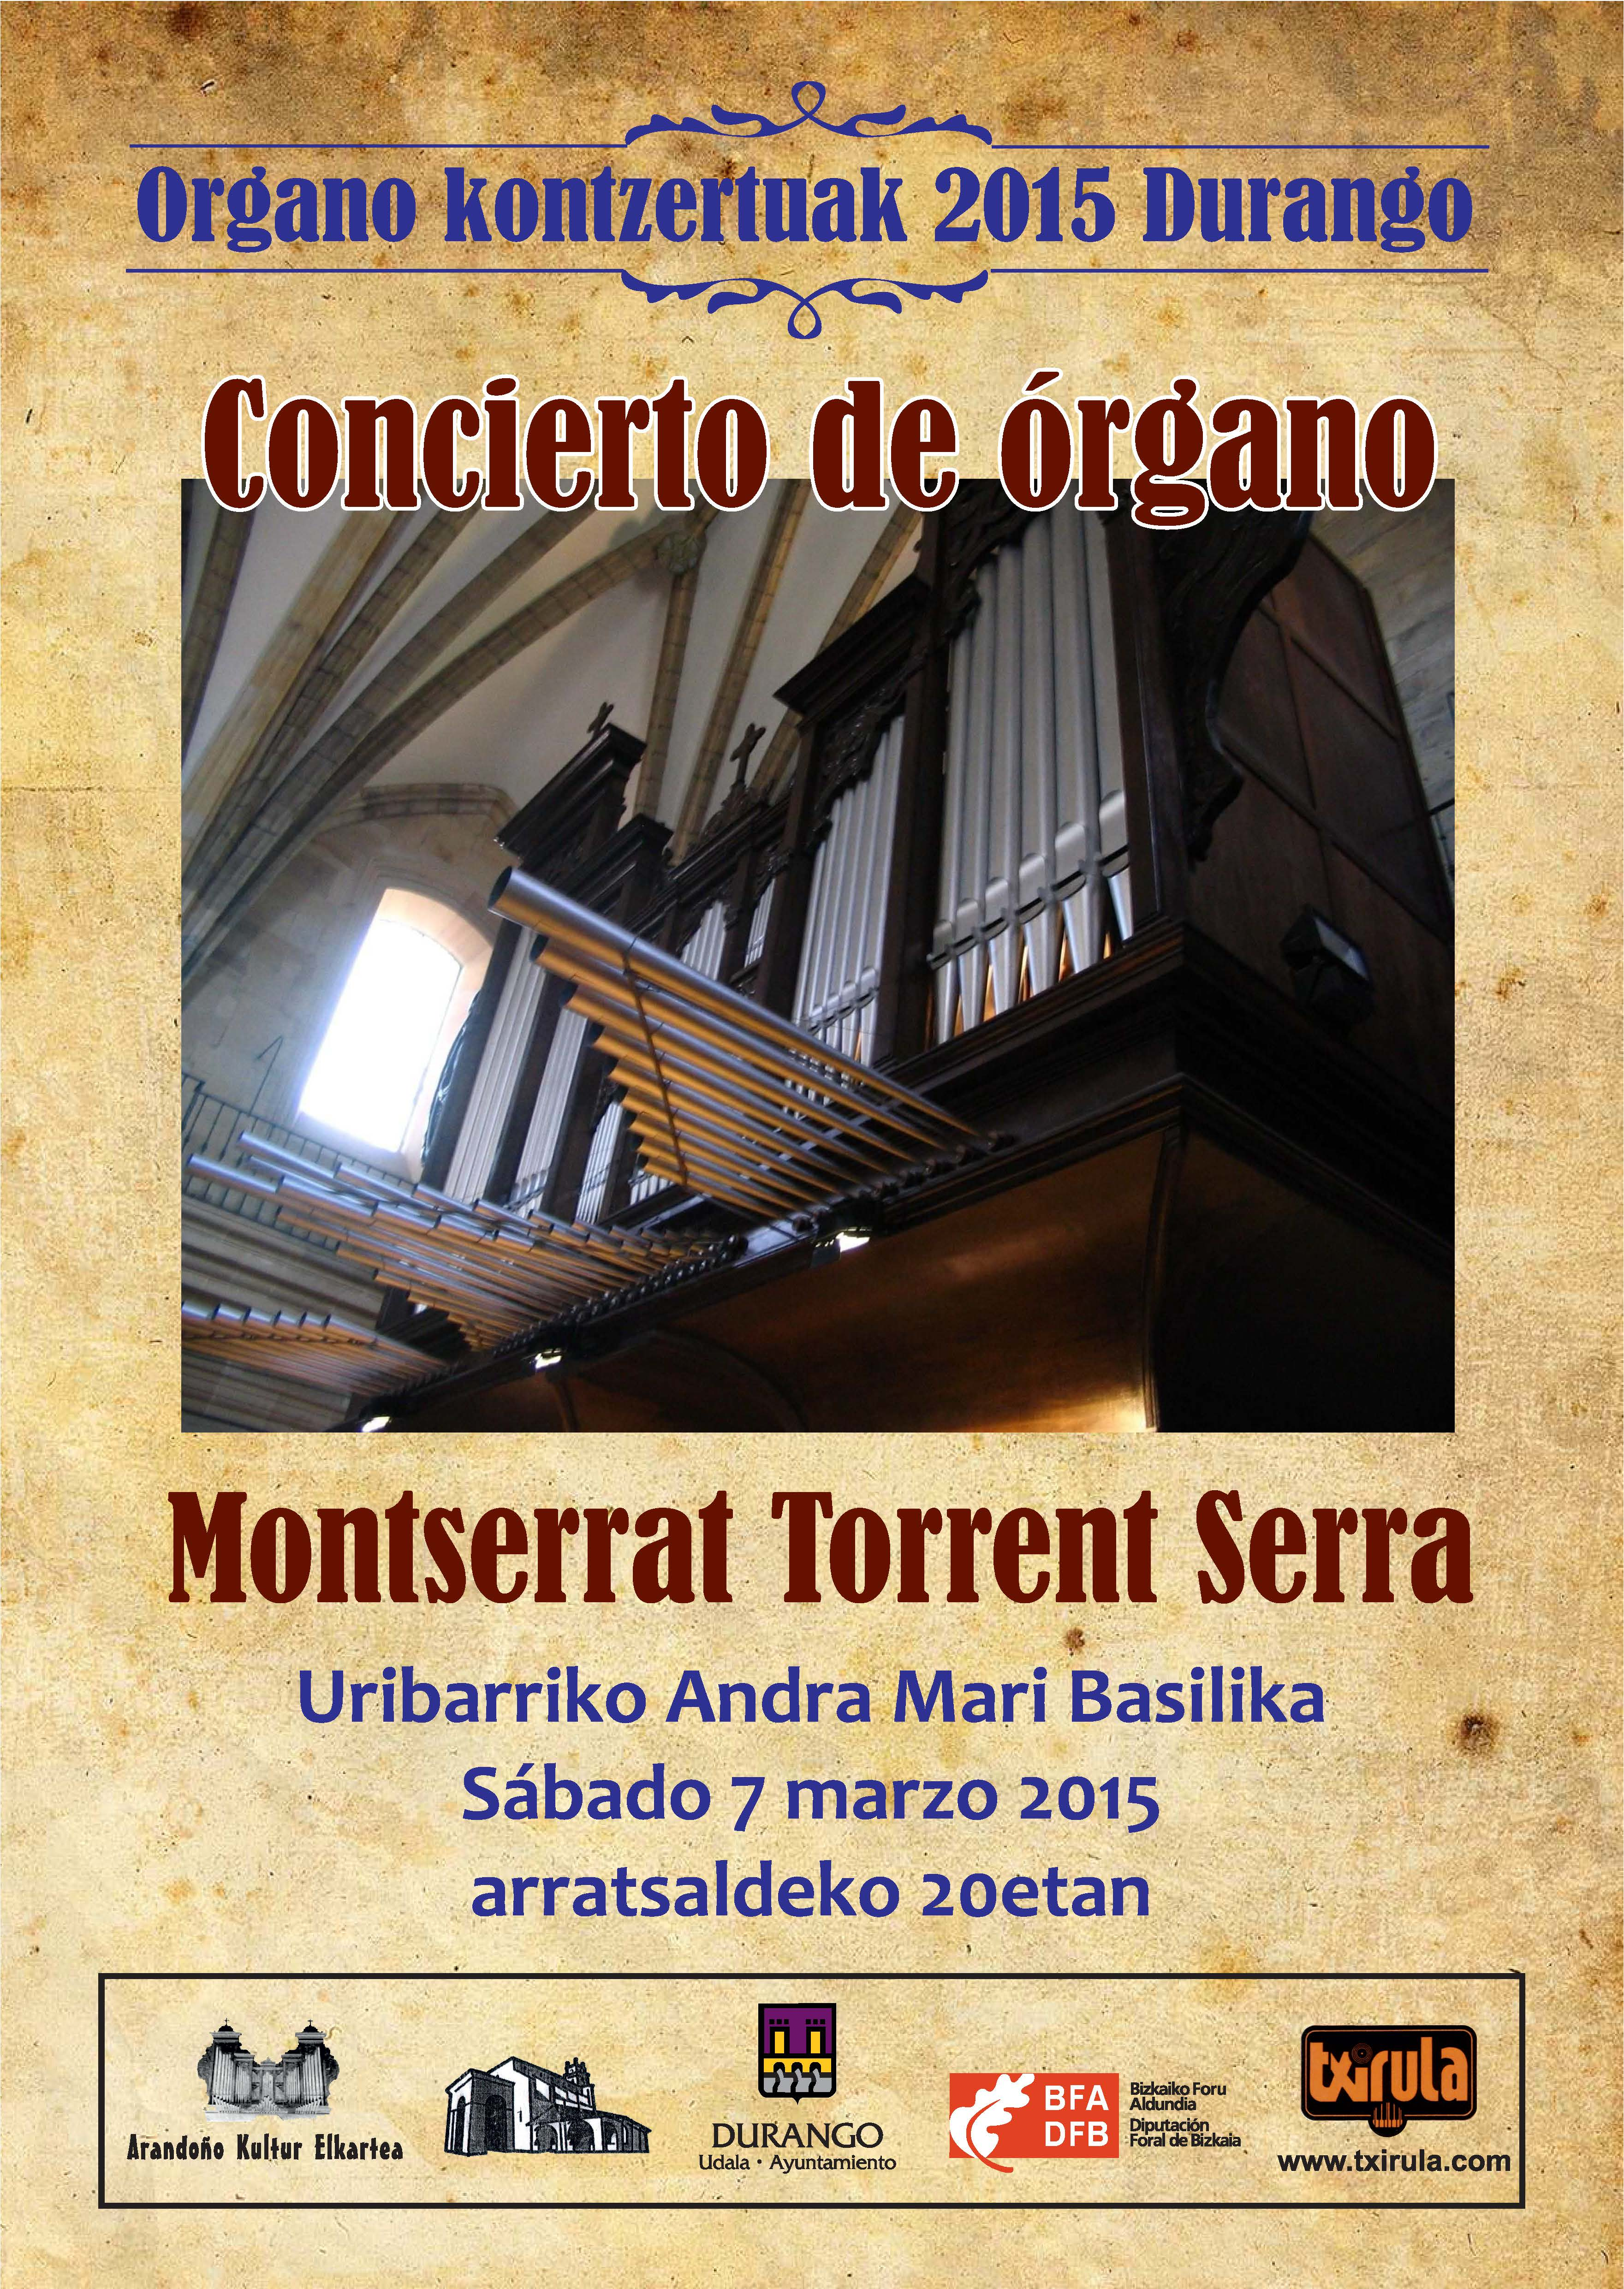 Montserrat Torrent reaparece en concierto en Durango